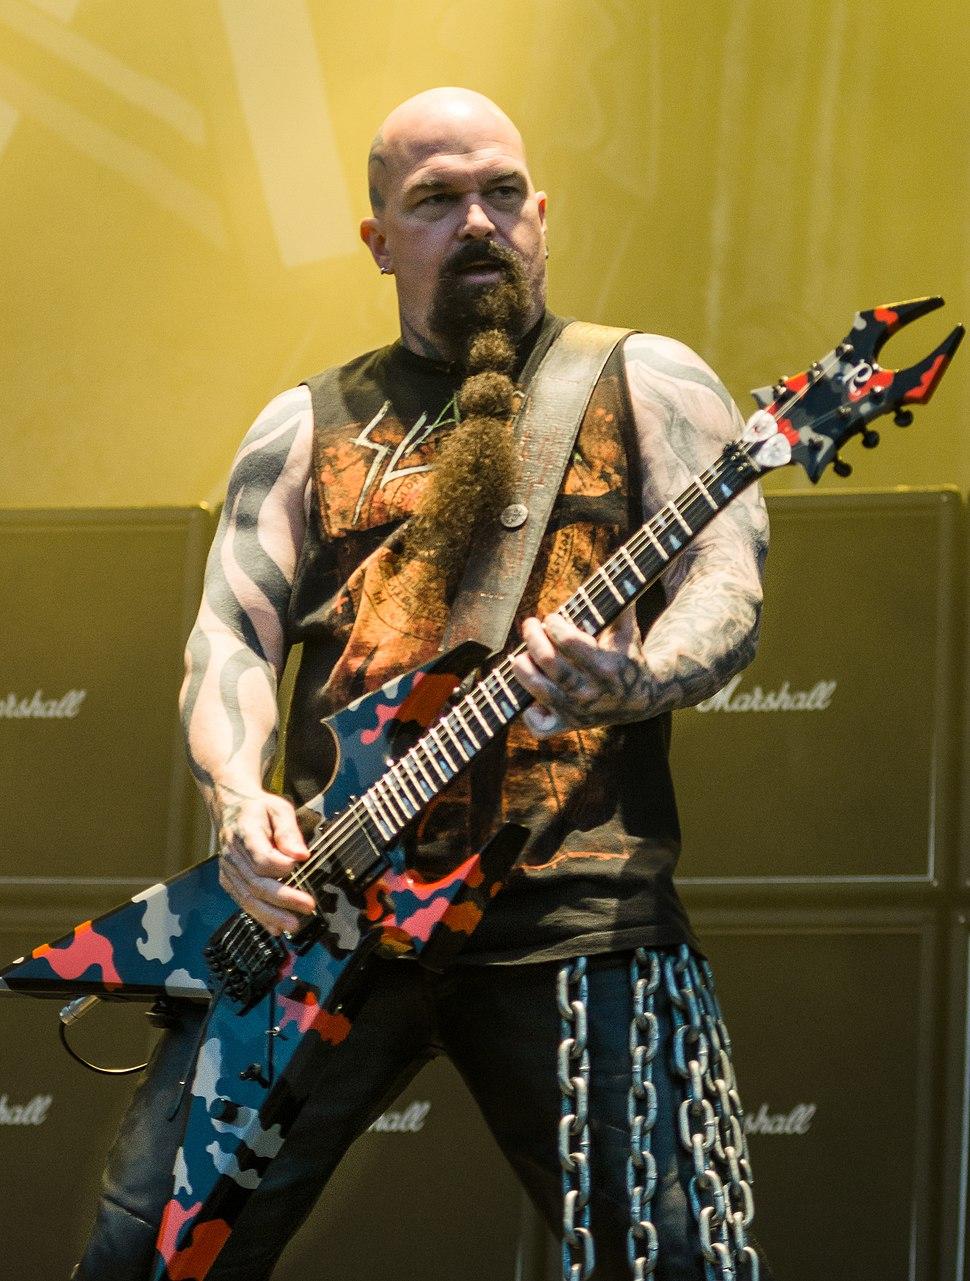 Ursynalia 2012, Slayer, Kerry King 01